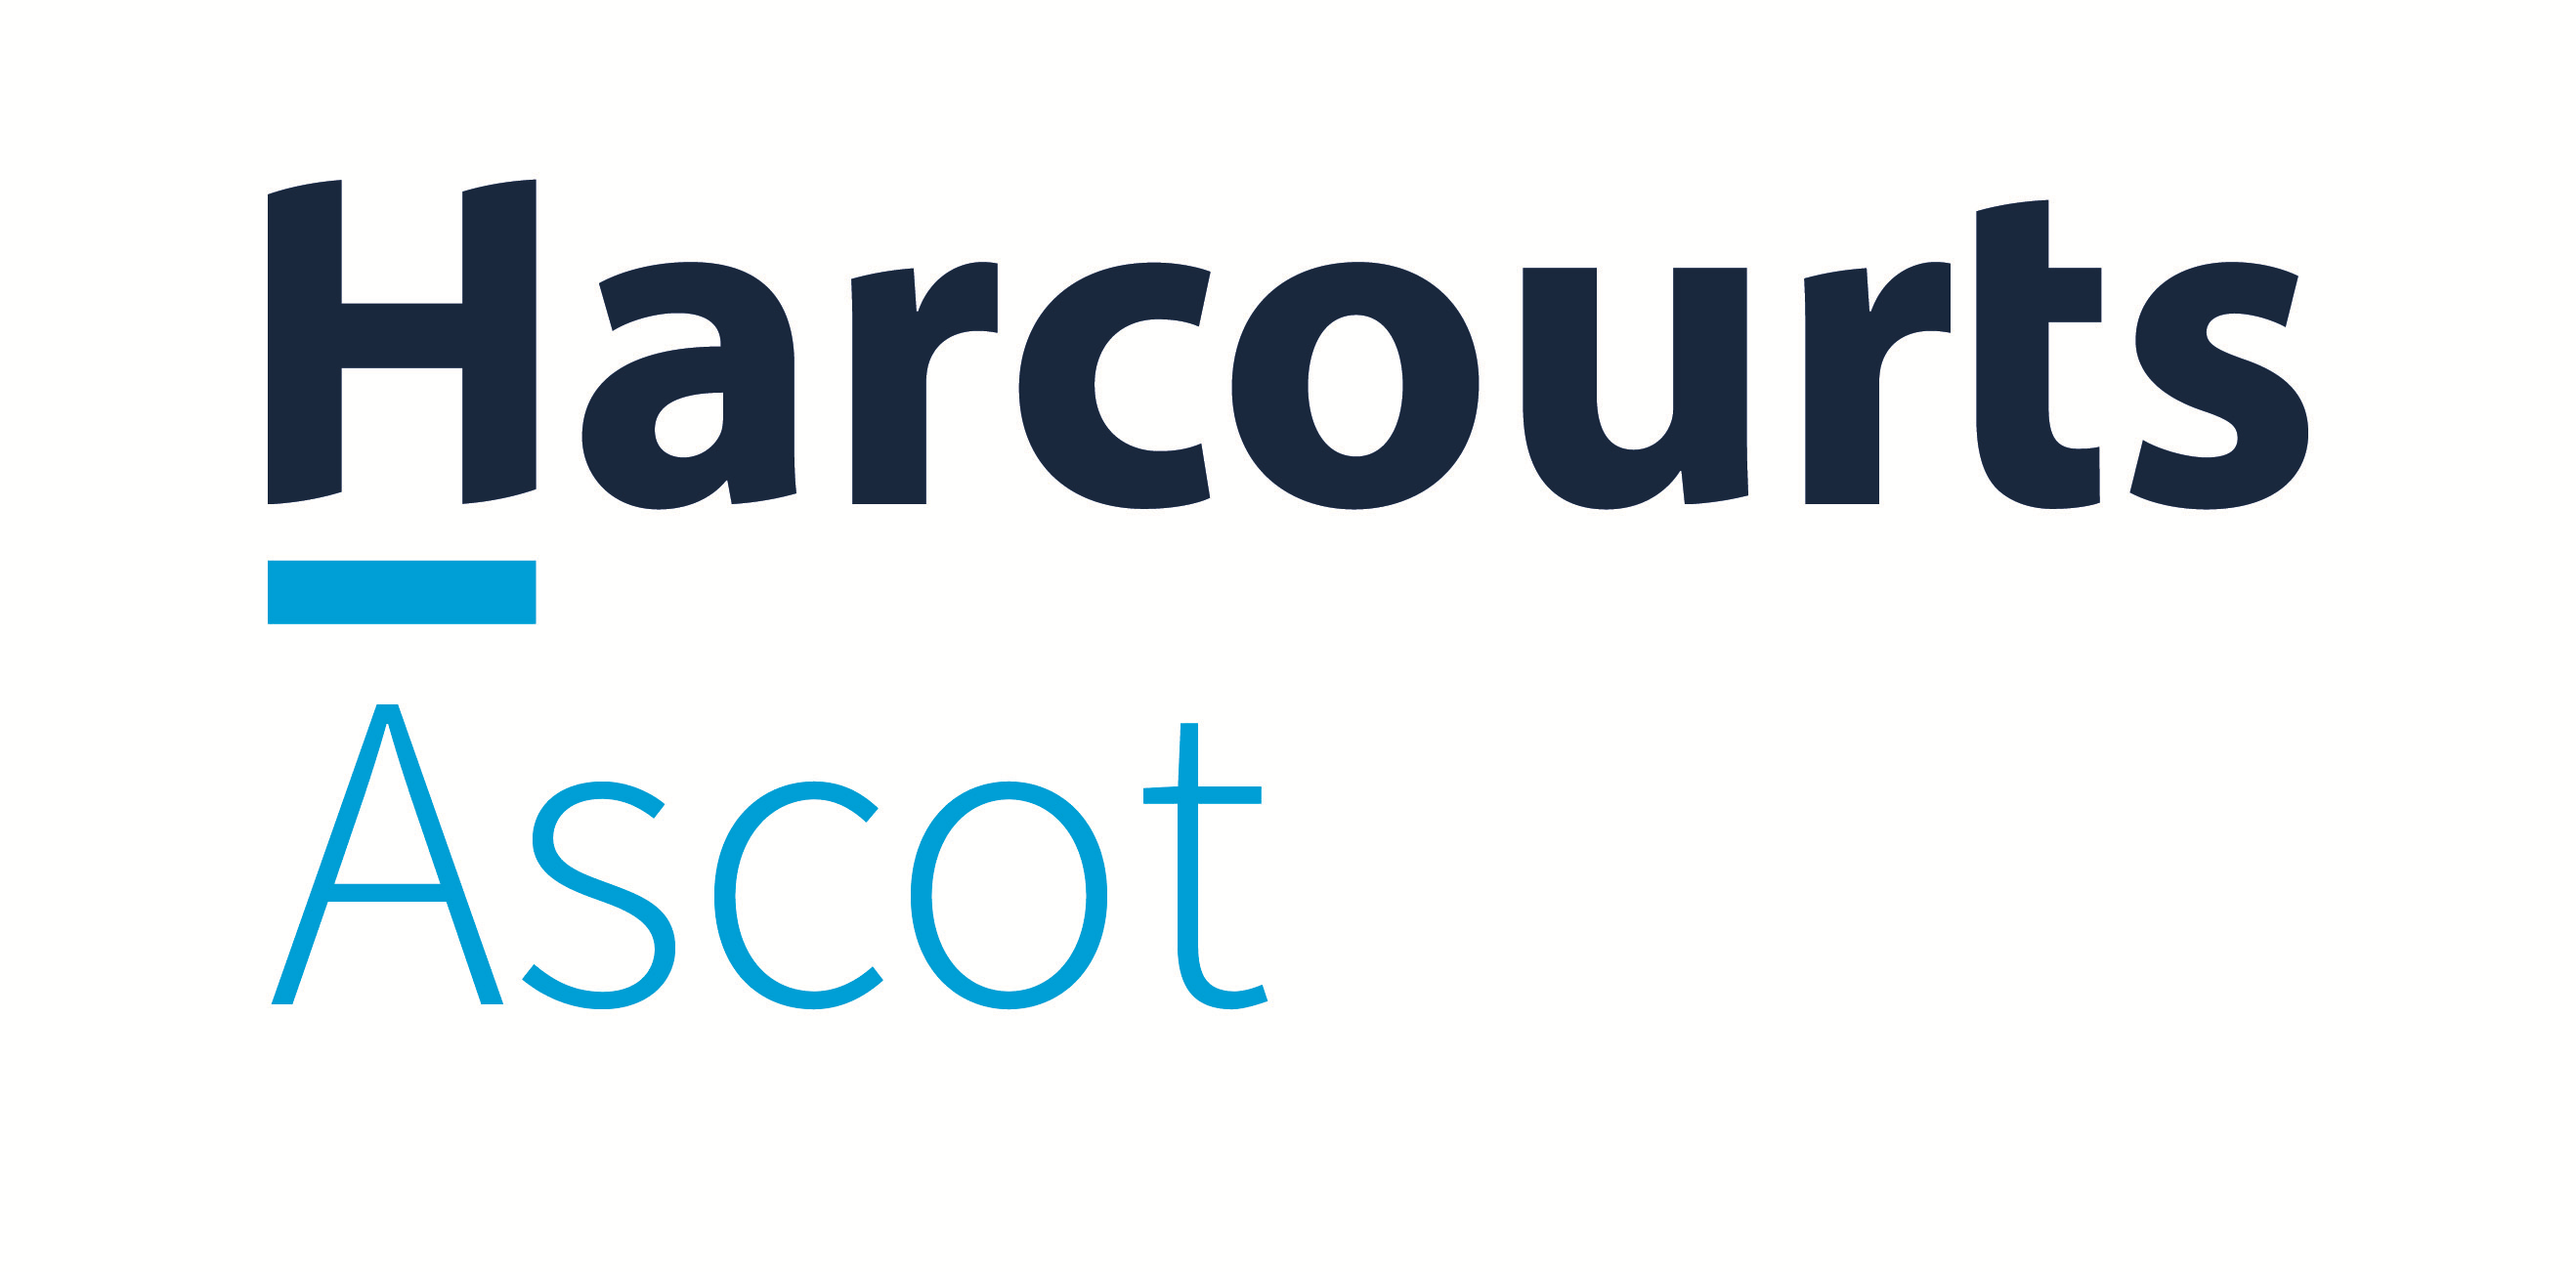 Harcourts, Ascot, 4007